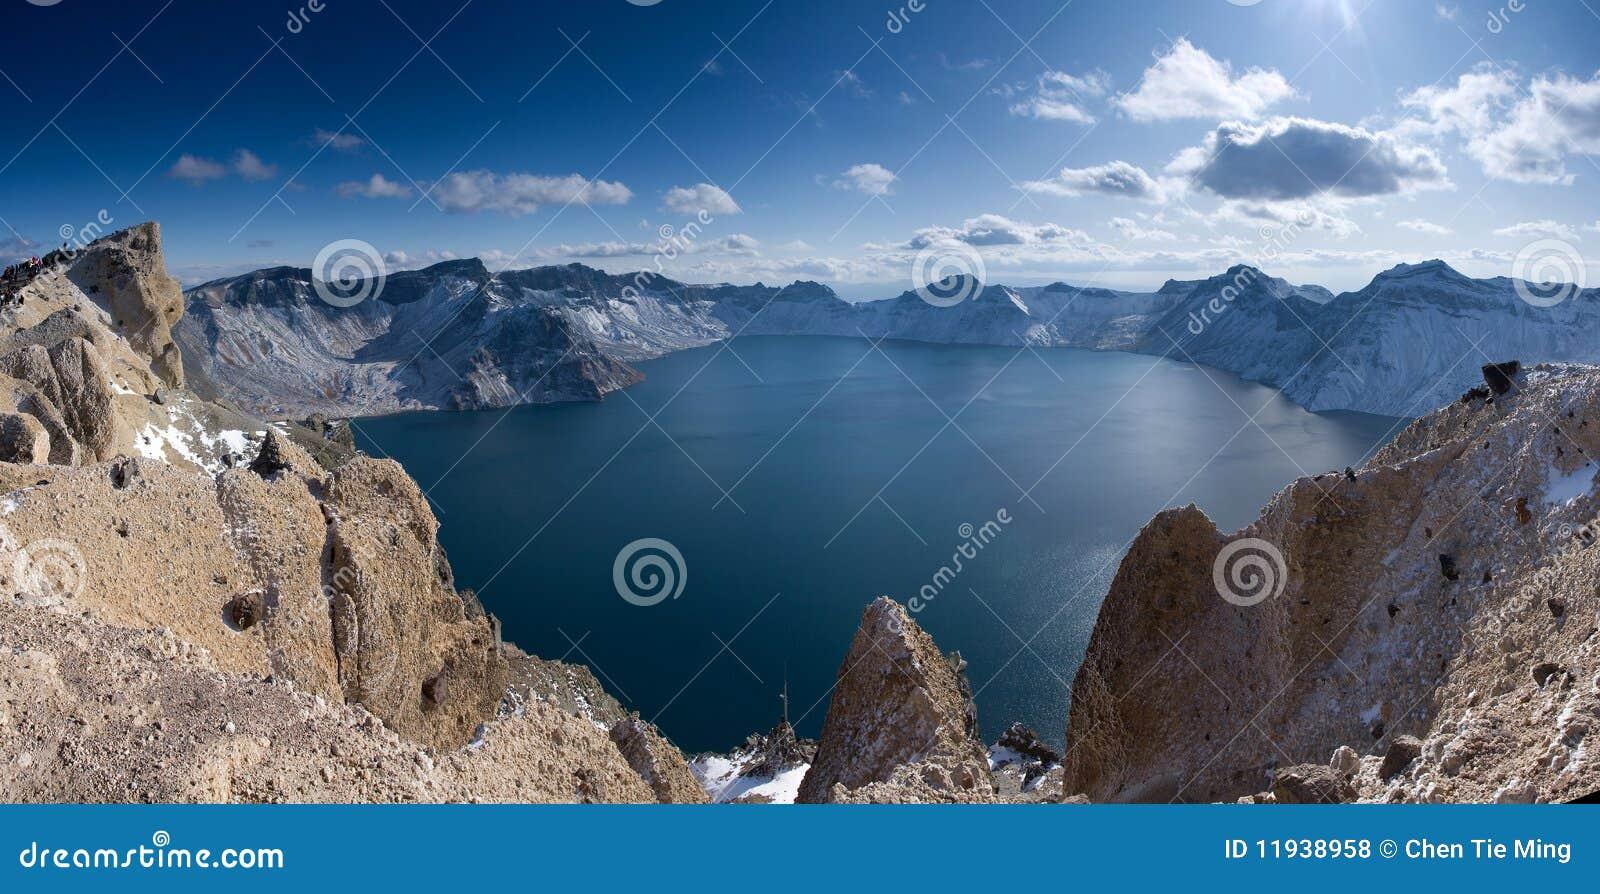 Tianchi Lake in the Changbai Mountain